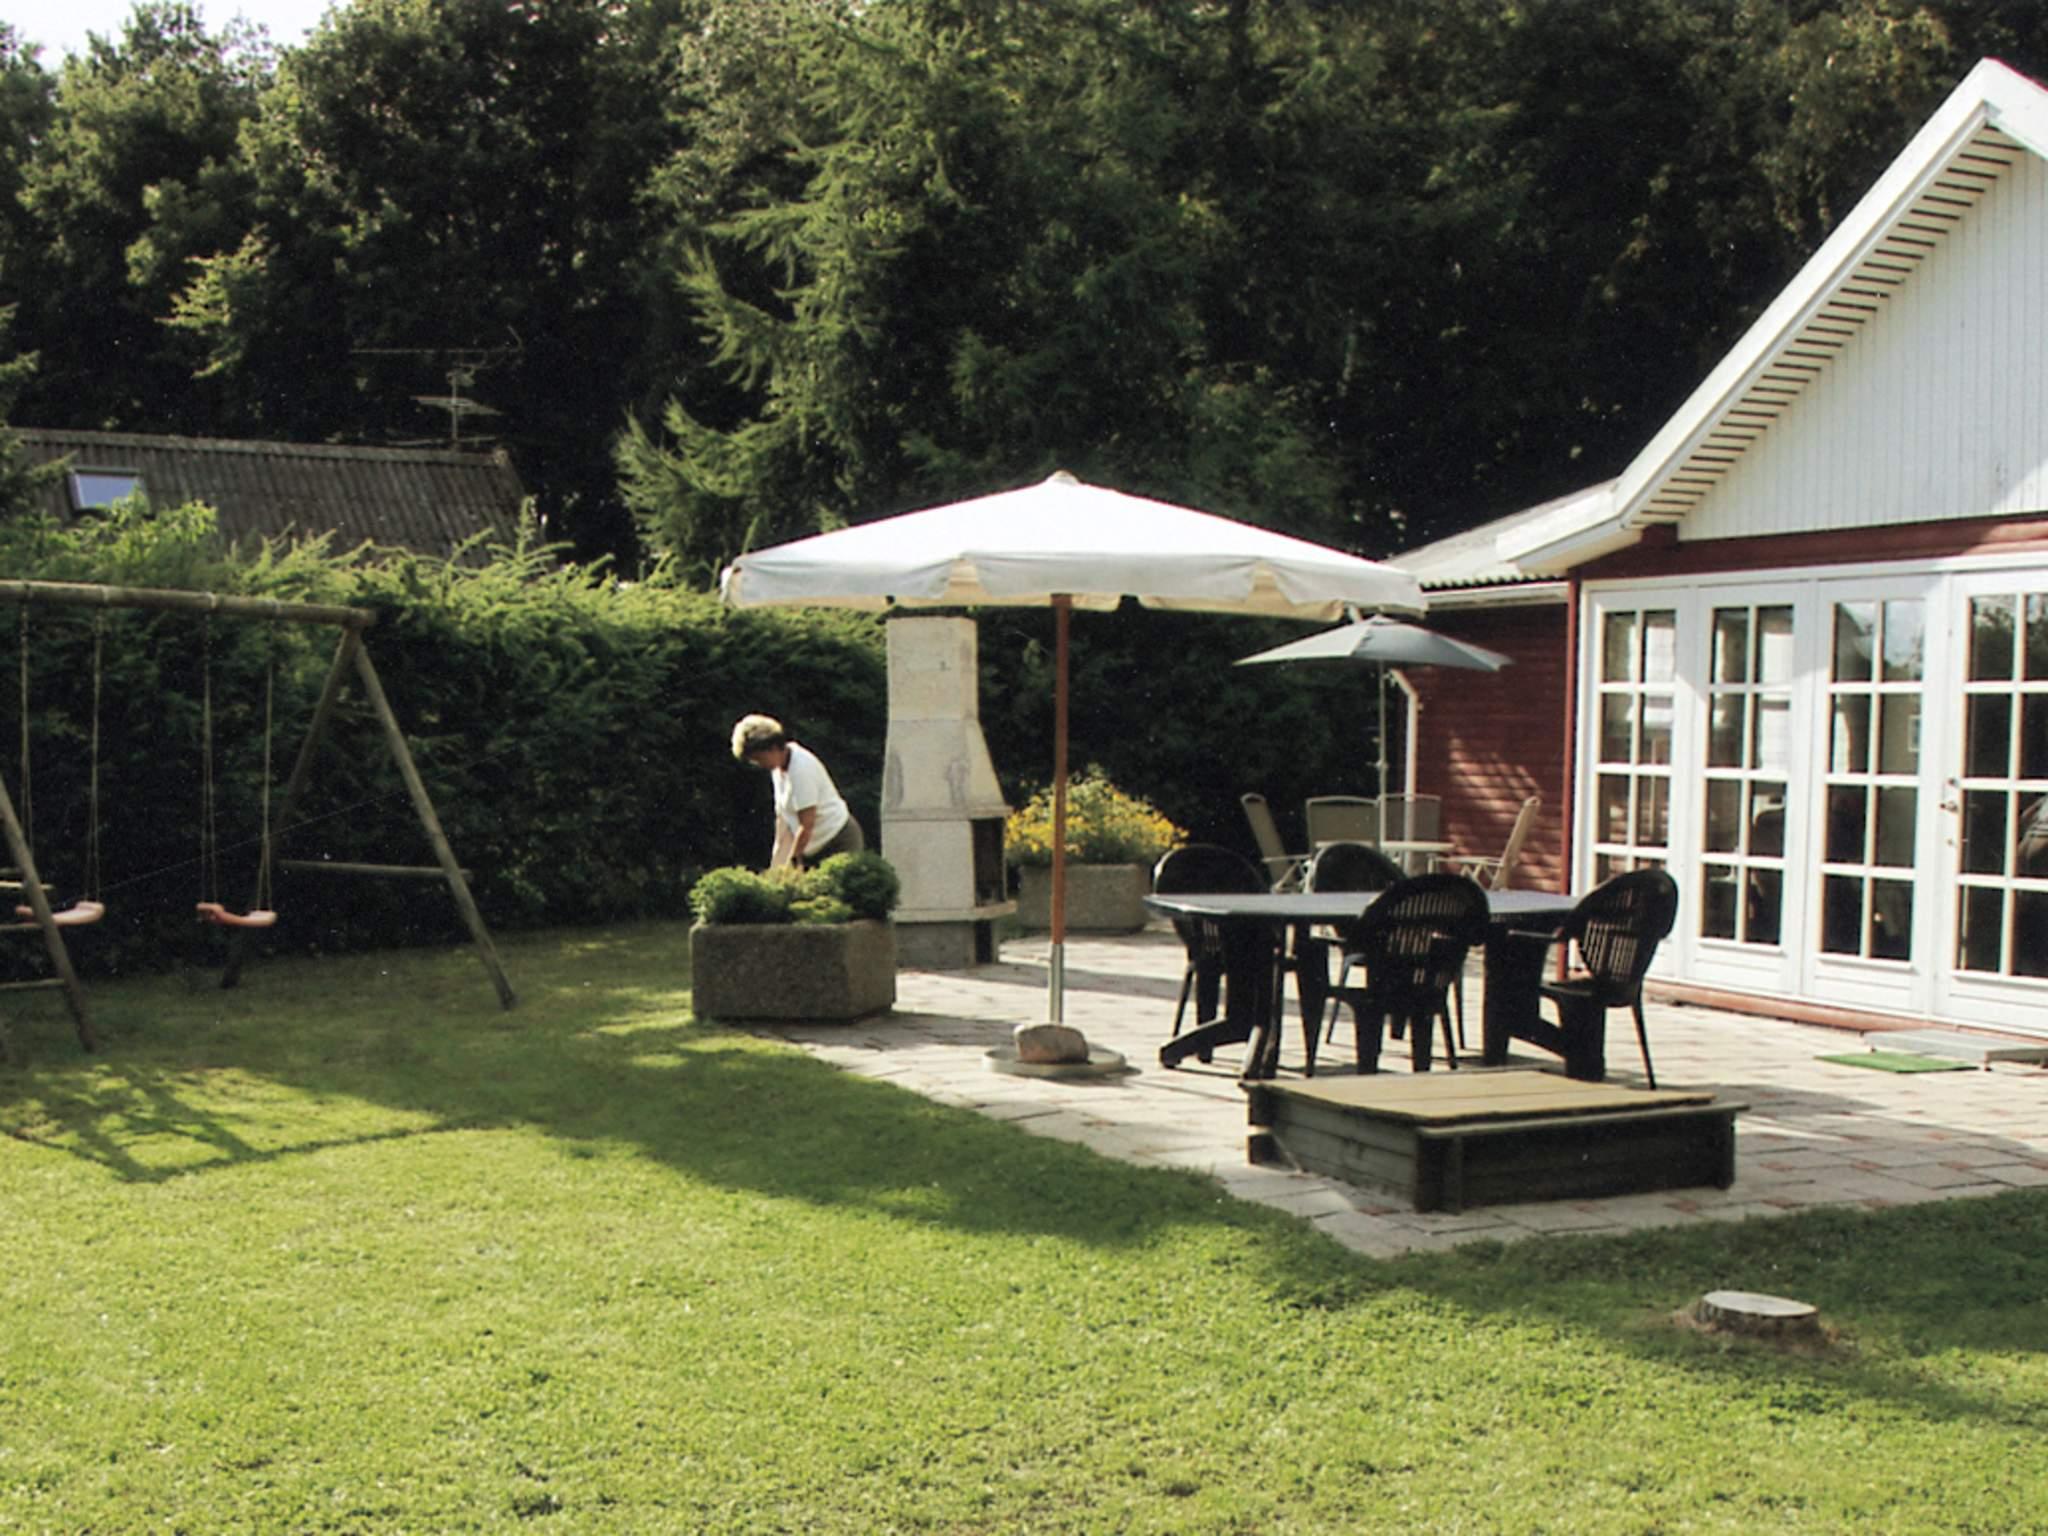 Ferienhaus Skovmose/Als (82561), Skovby, , Südostjütland, Dänemark, Bild 16